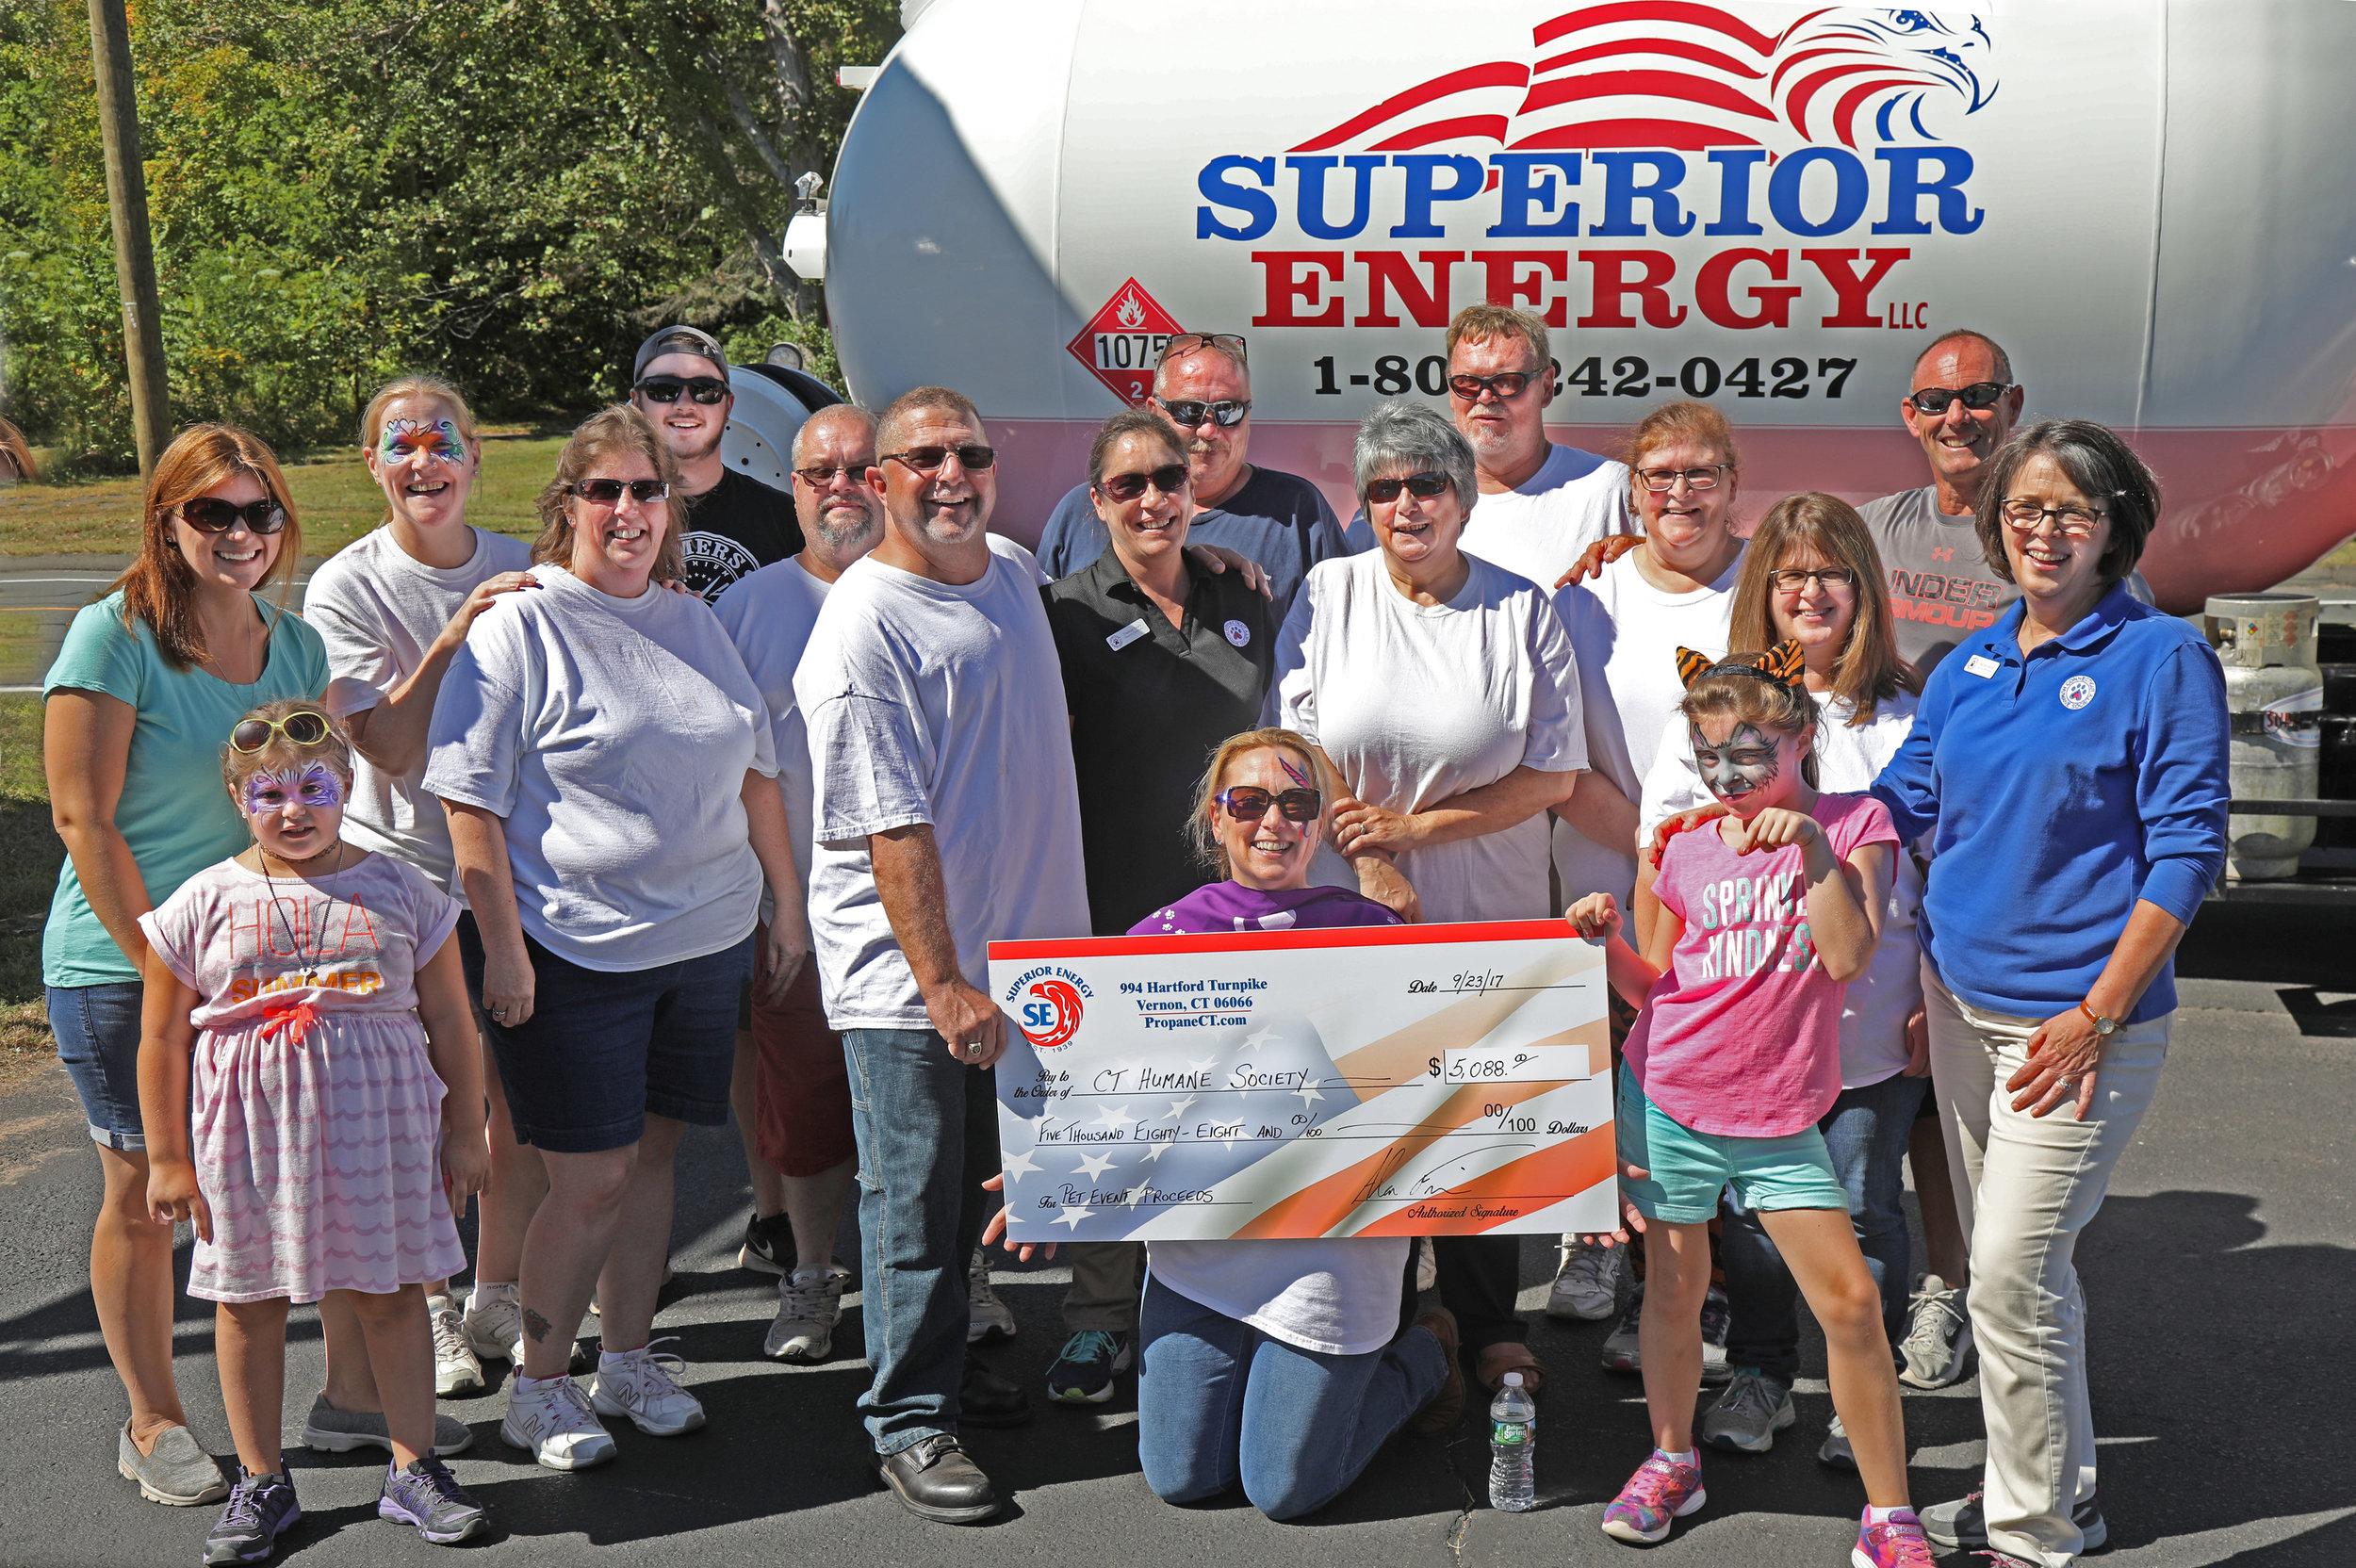 CHS-Superior Energy-Sep 24 2017-Group Photo-1163--300 dpi-Done.jpg